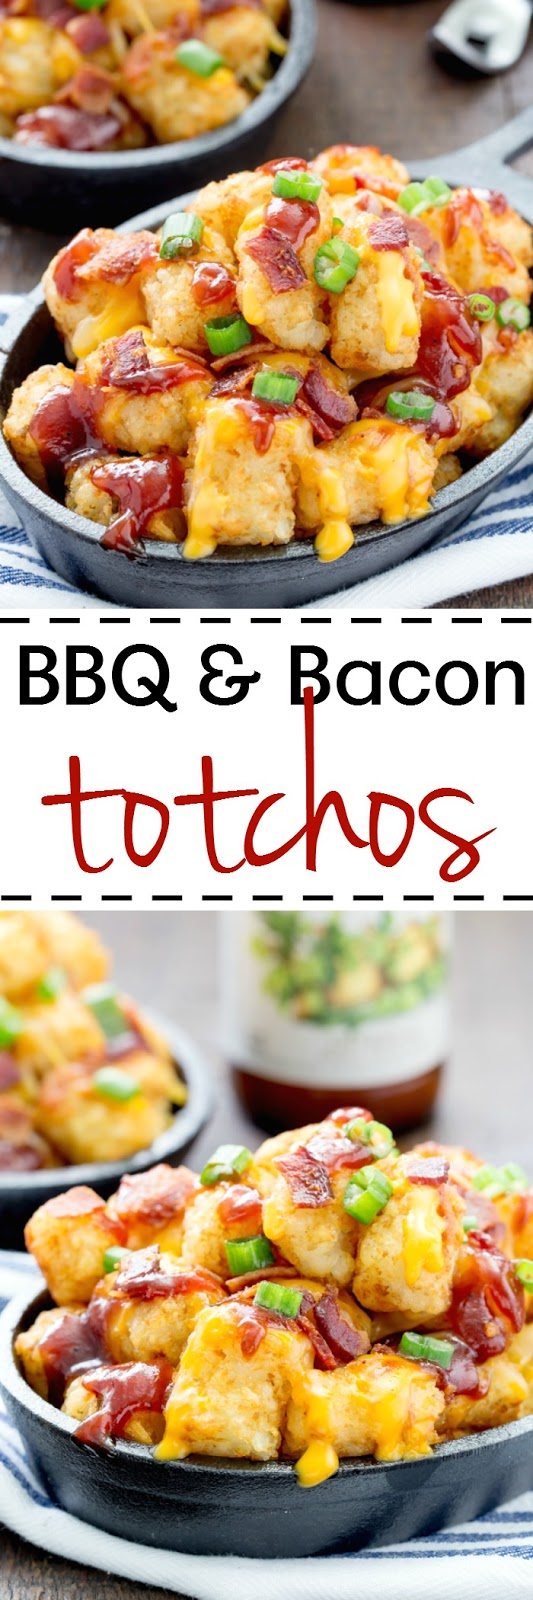 Cheesy BBQ and Bacon Totchos